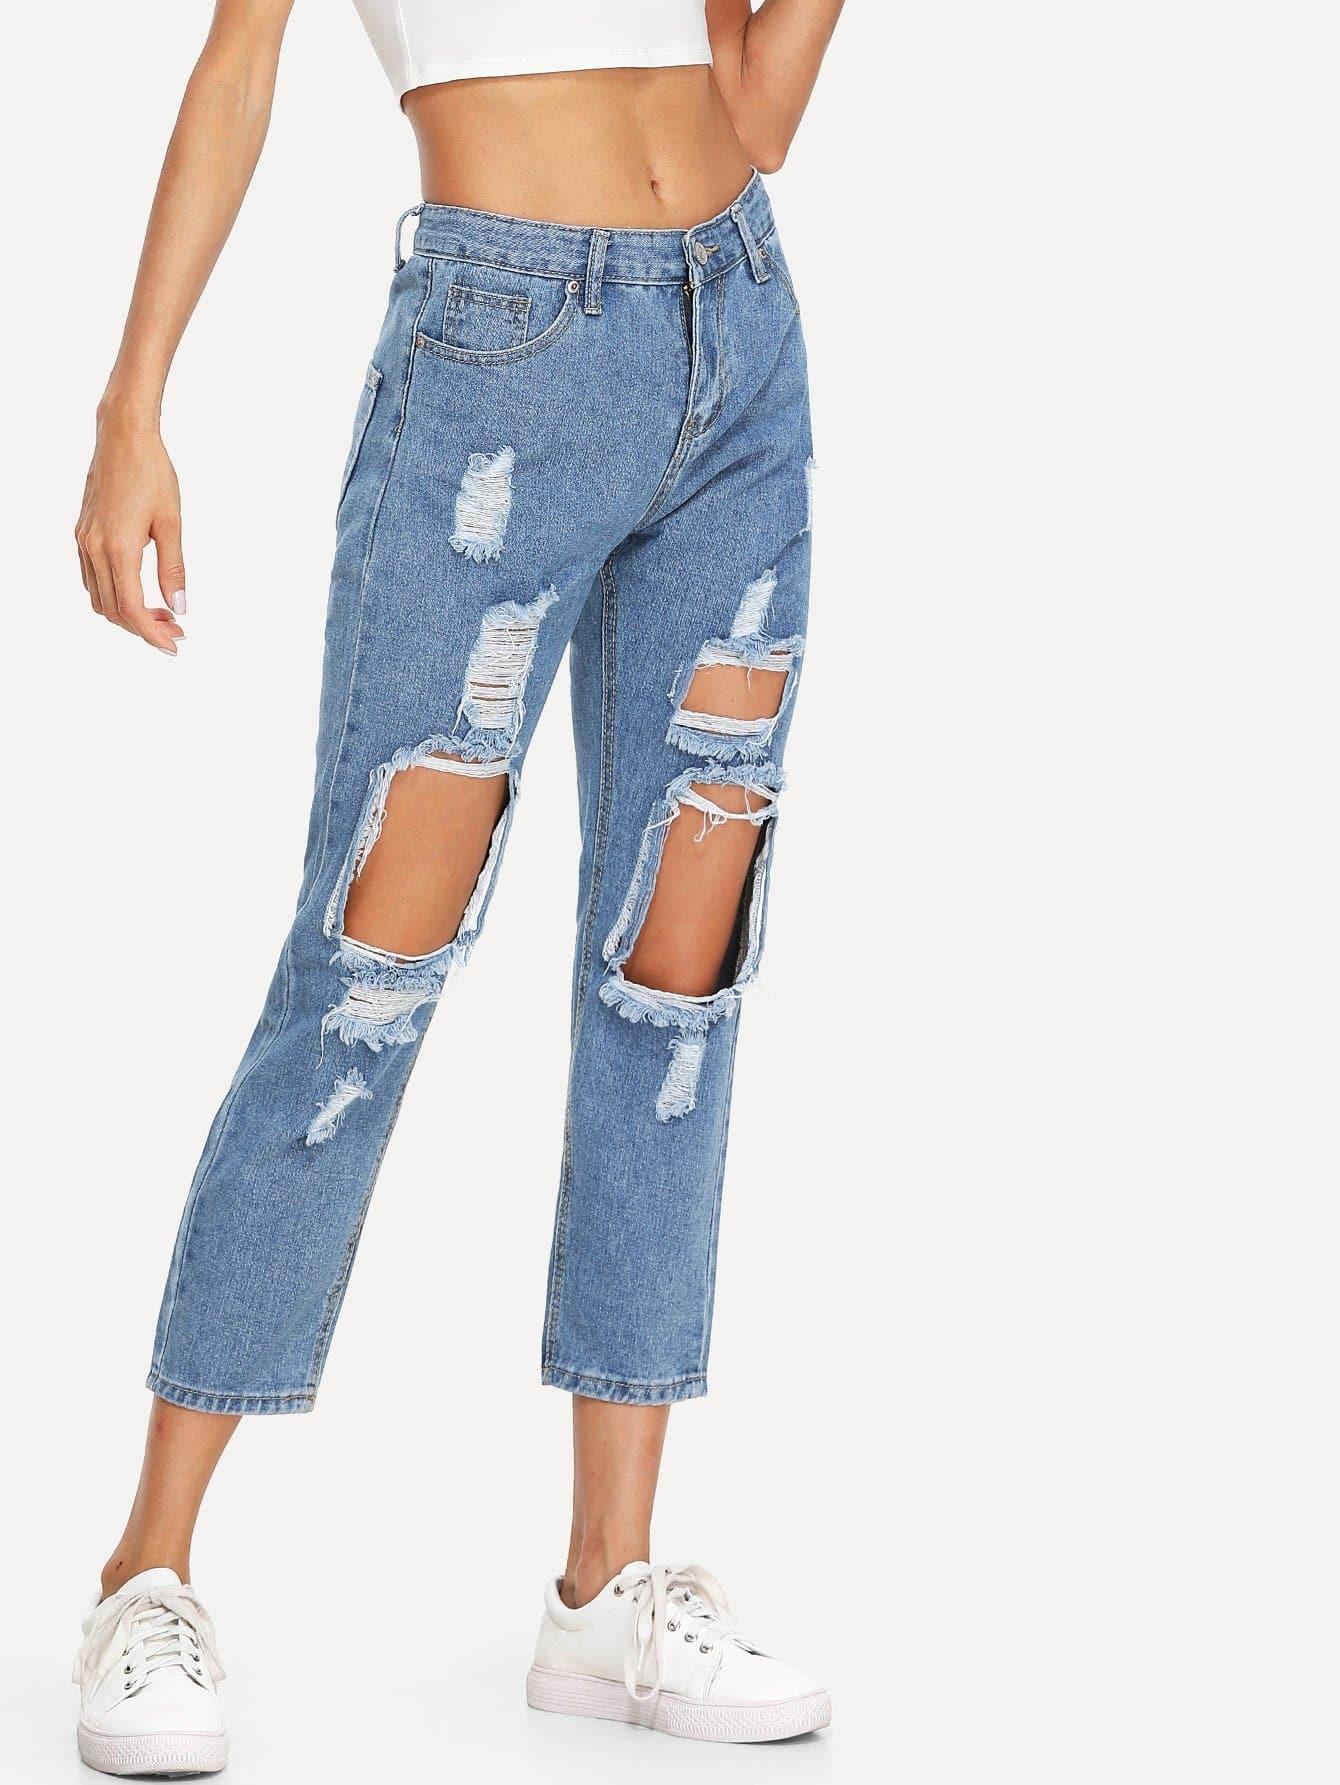 jeans trou d chir french shein sheinside. Black Bedroom Furniture Sets. Home Design Ideas